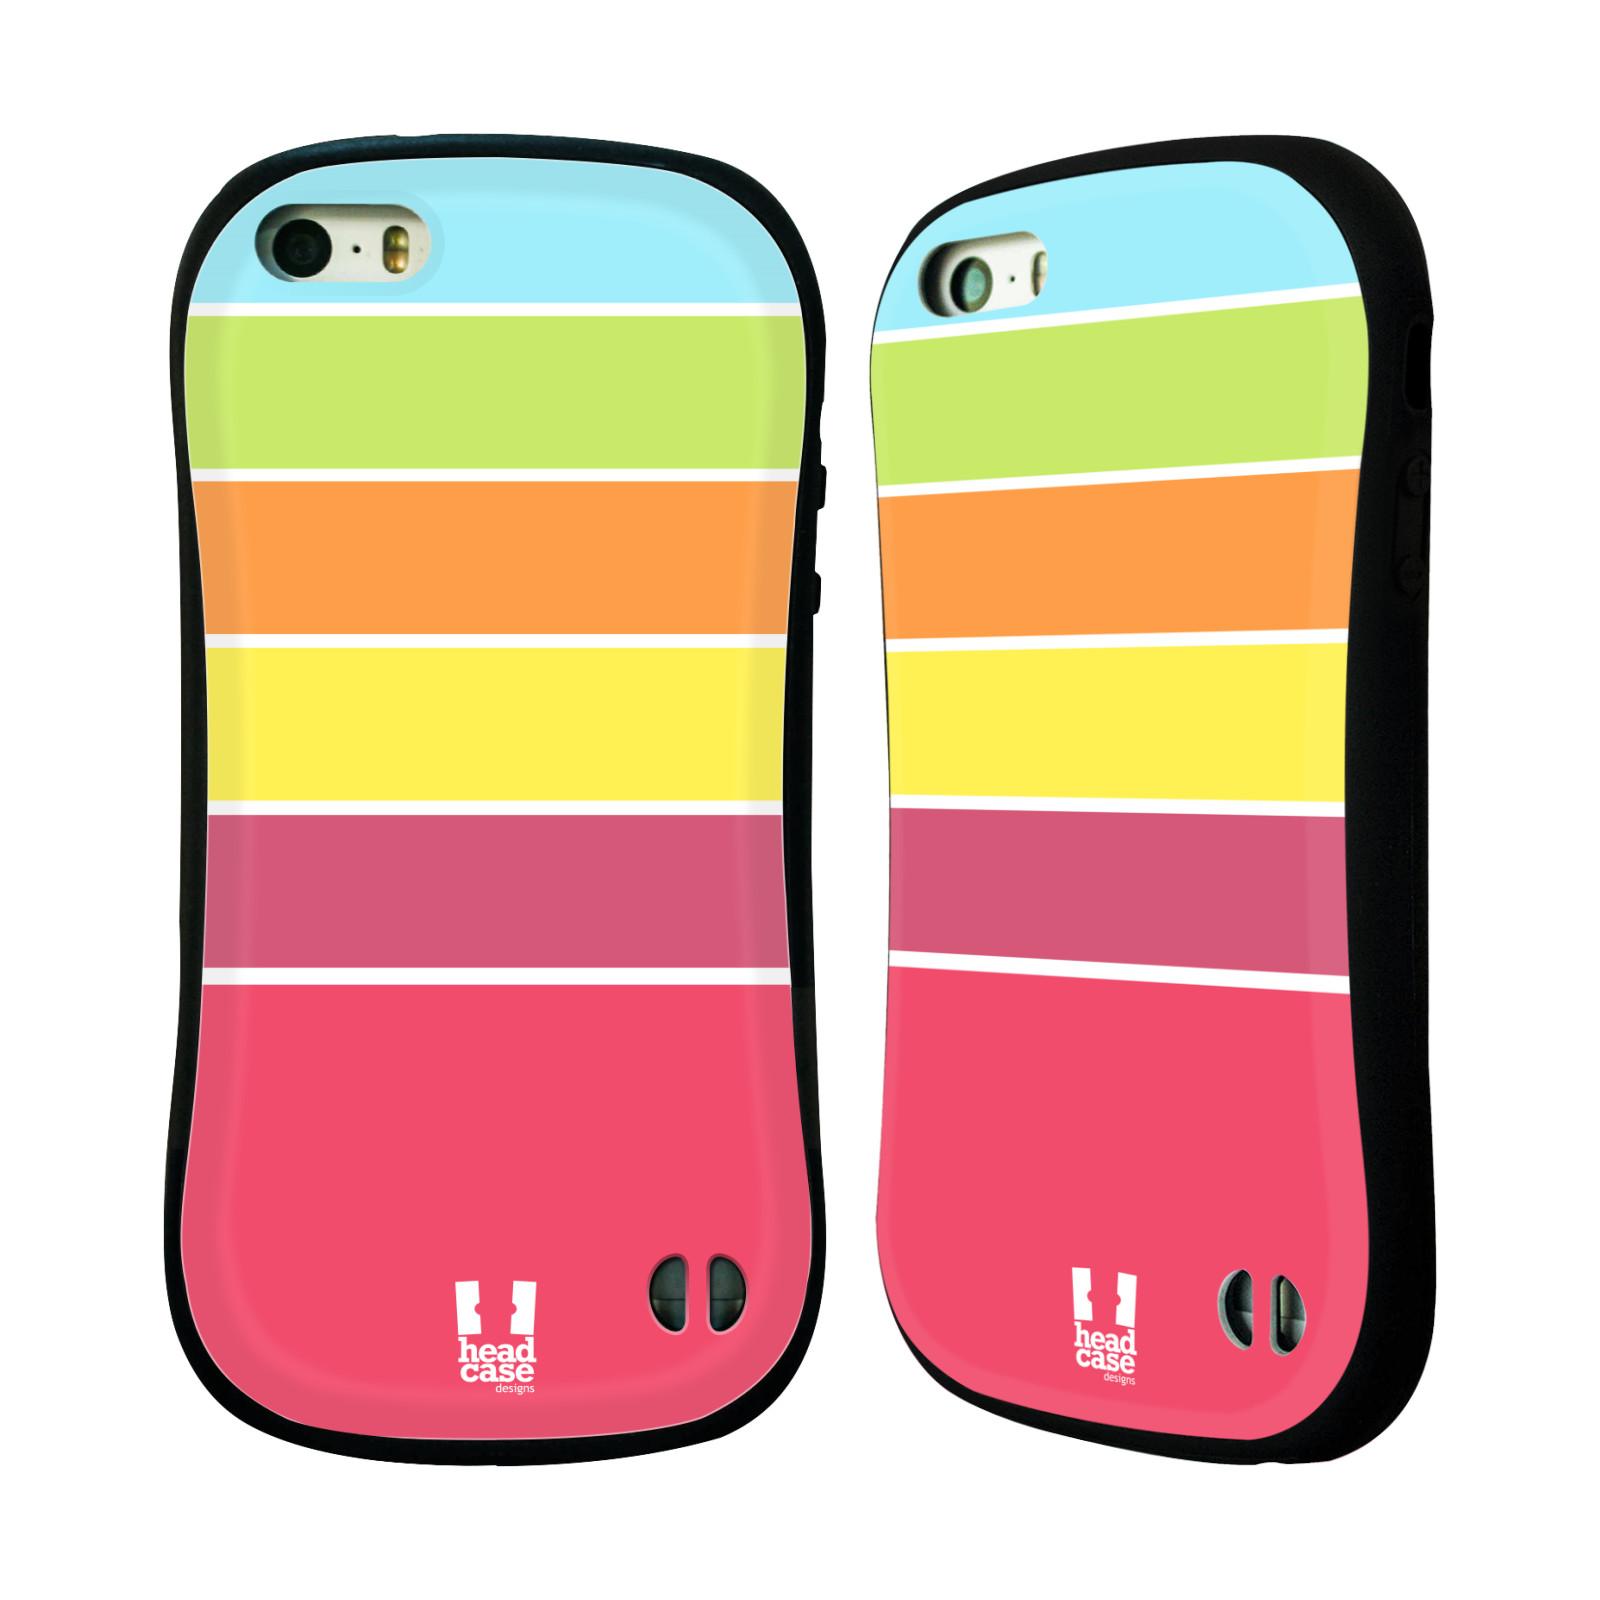 HEAD CASE silikon/plast odolný obal na mobil Apple Iphone 5/5S vzor Barevné proužky RŮŽOVÁ, ORANŽOVÁ, ZELENÁ